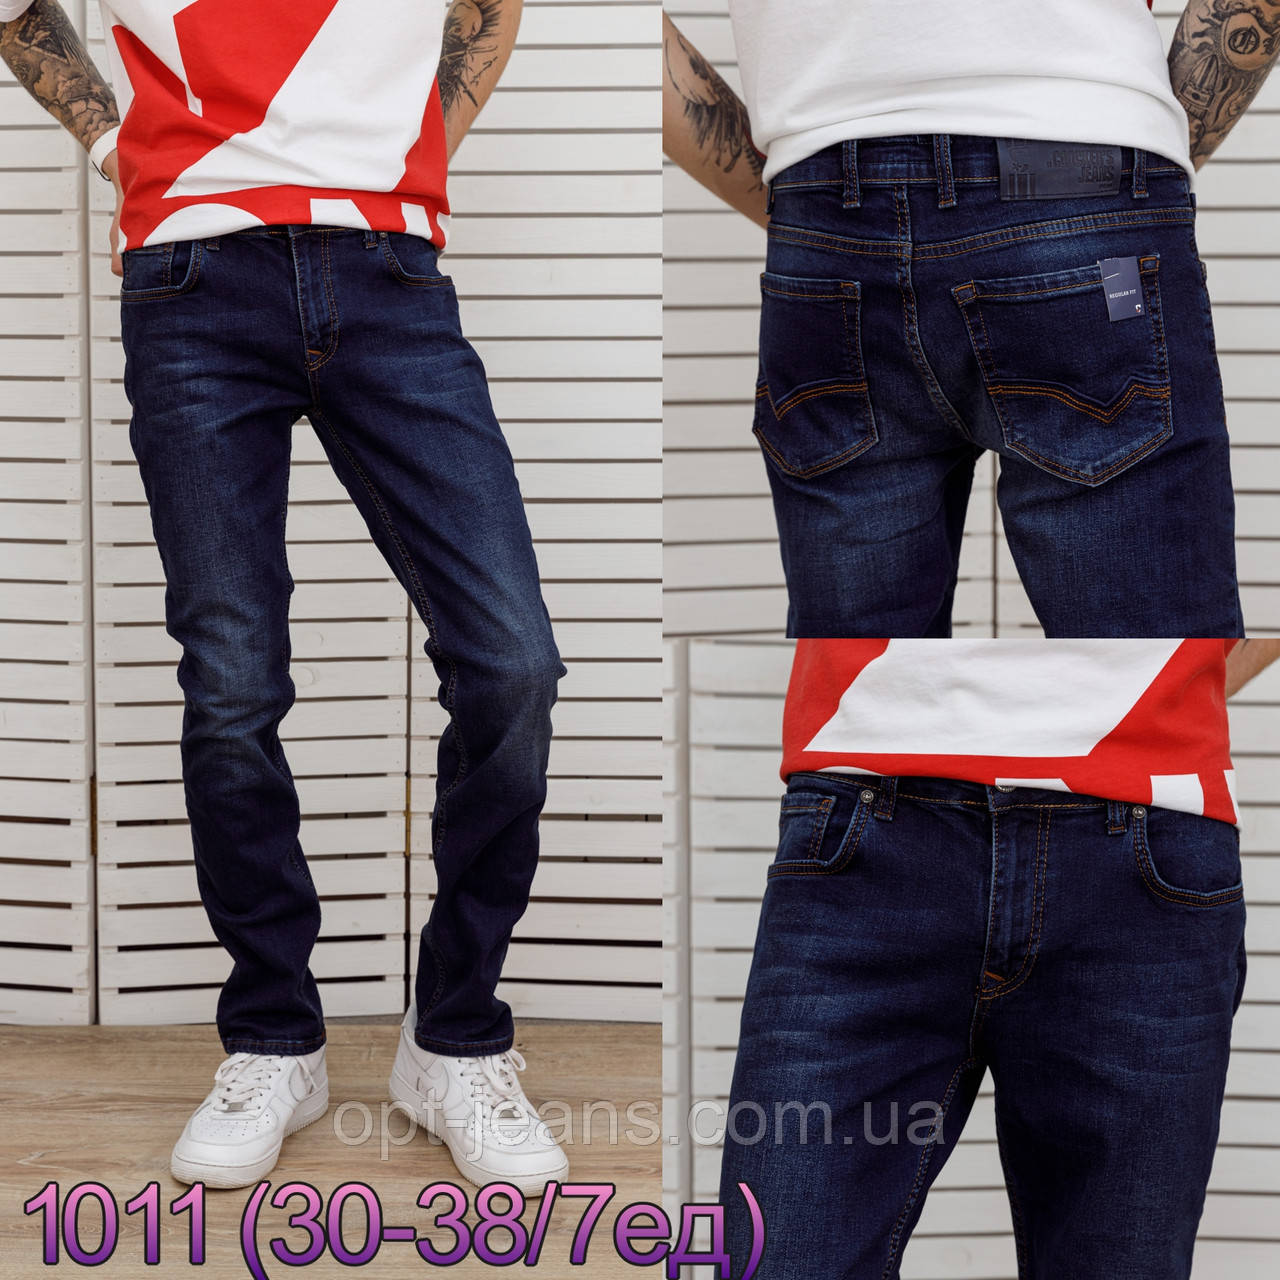 Coockers мужские джинсы (30-38/7ед.)